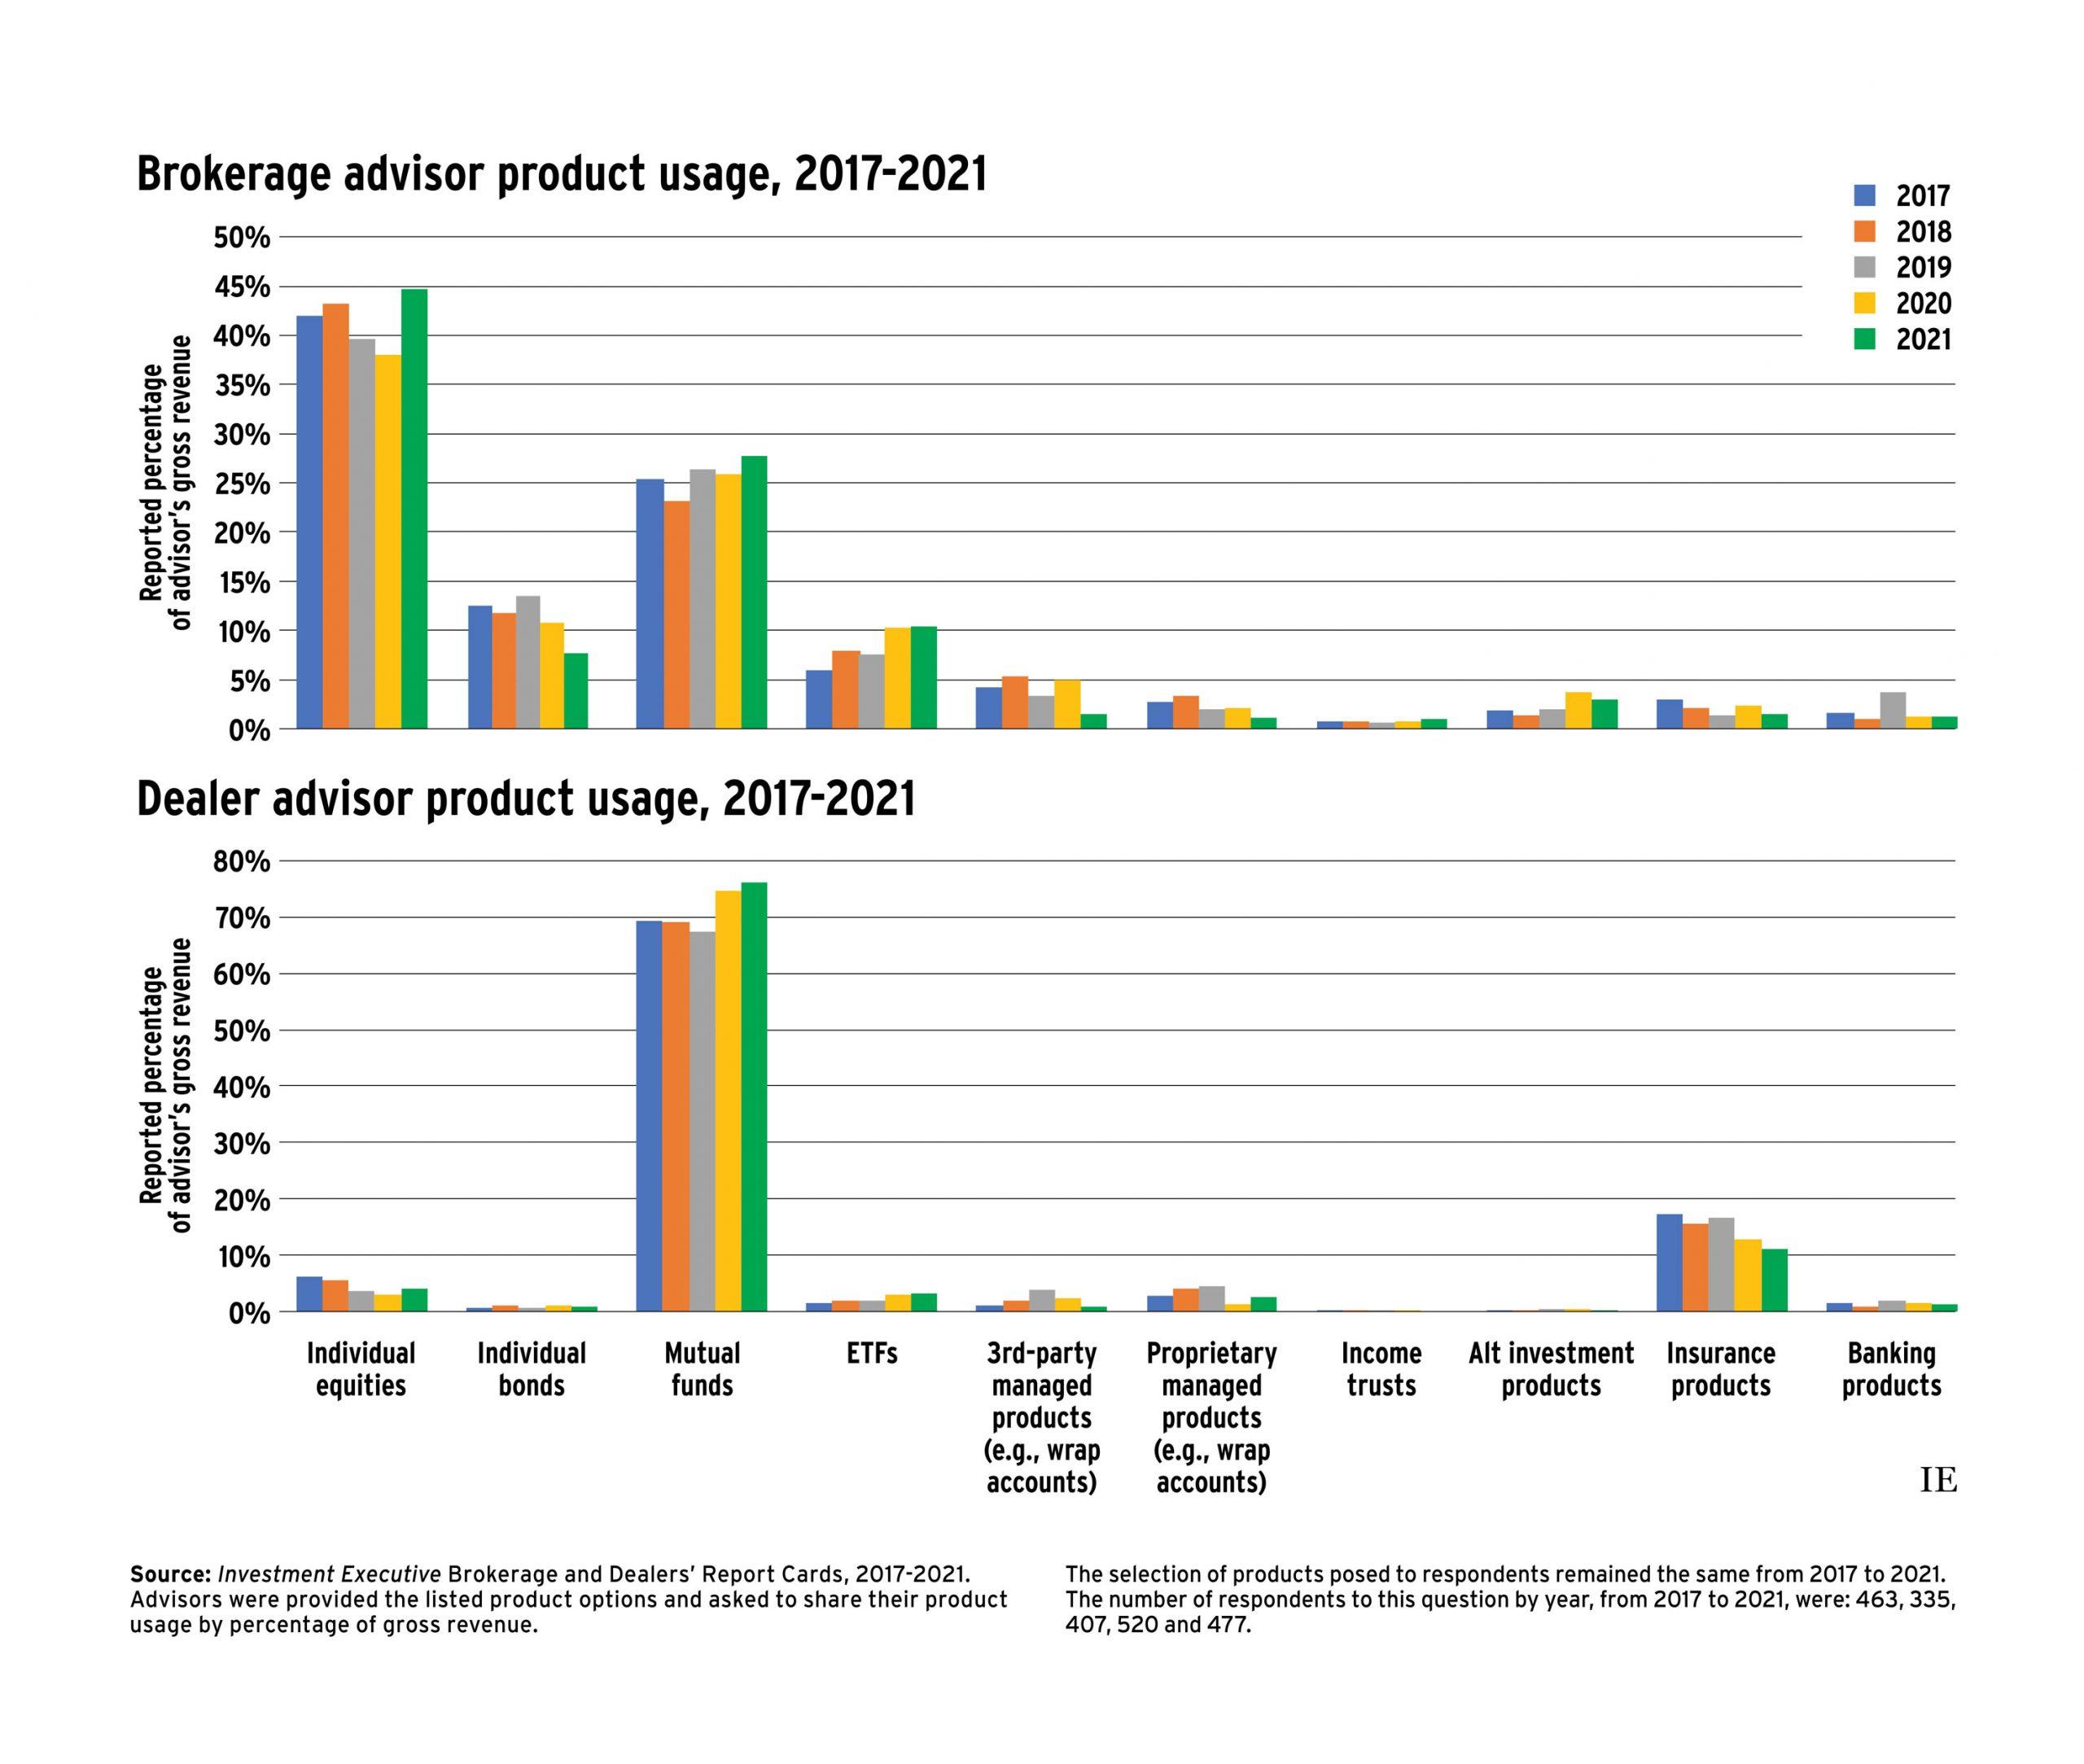 Brokerage advisor product usage, 2017 - 2021 and Dealer advisor product usage, 2017-2021